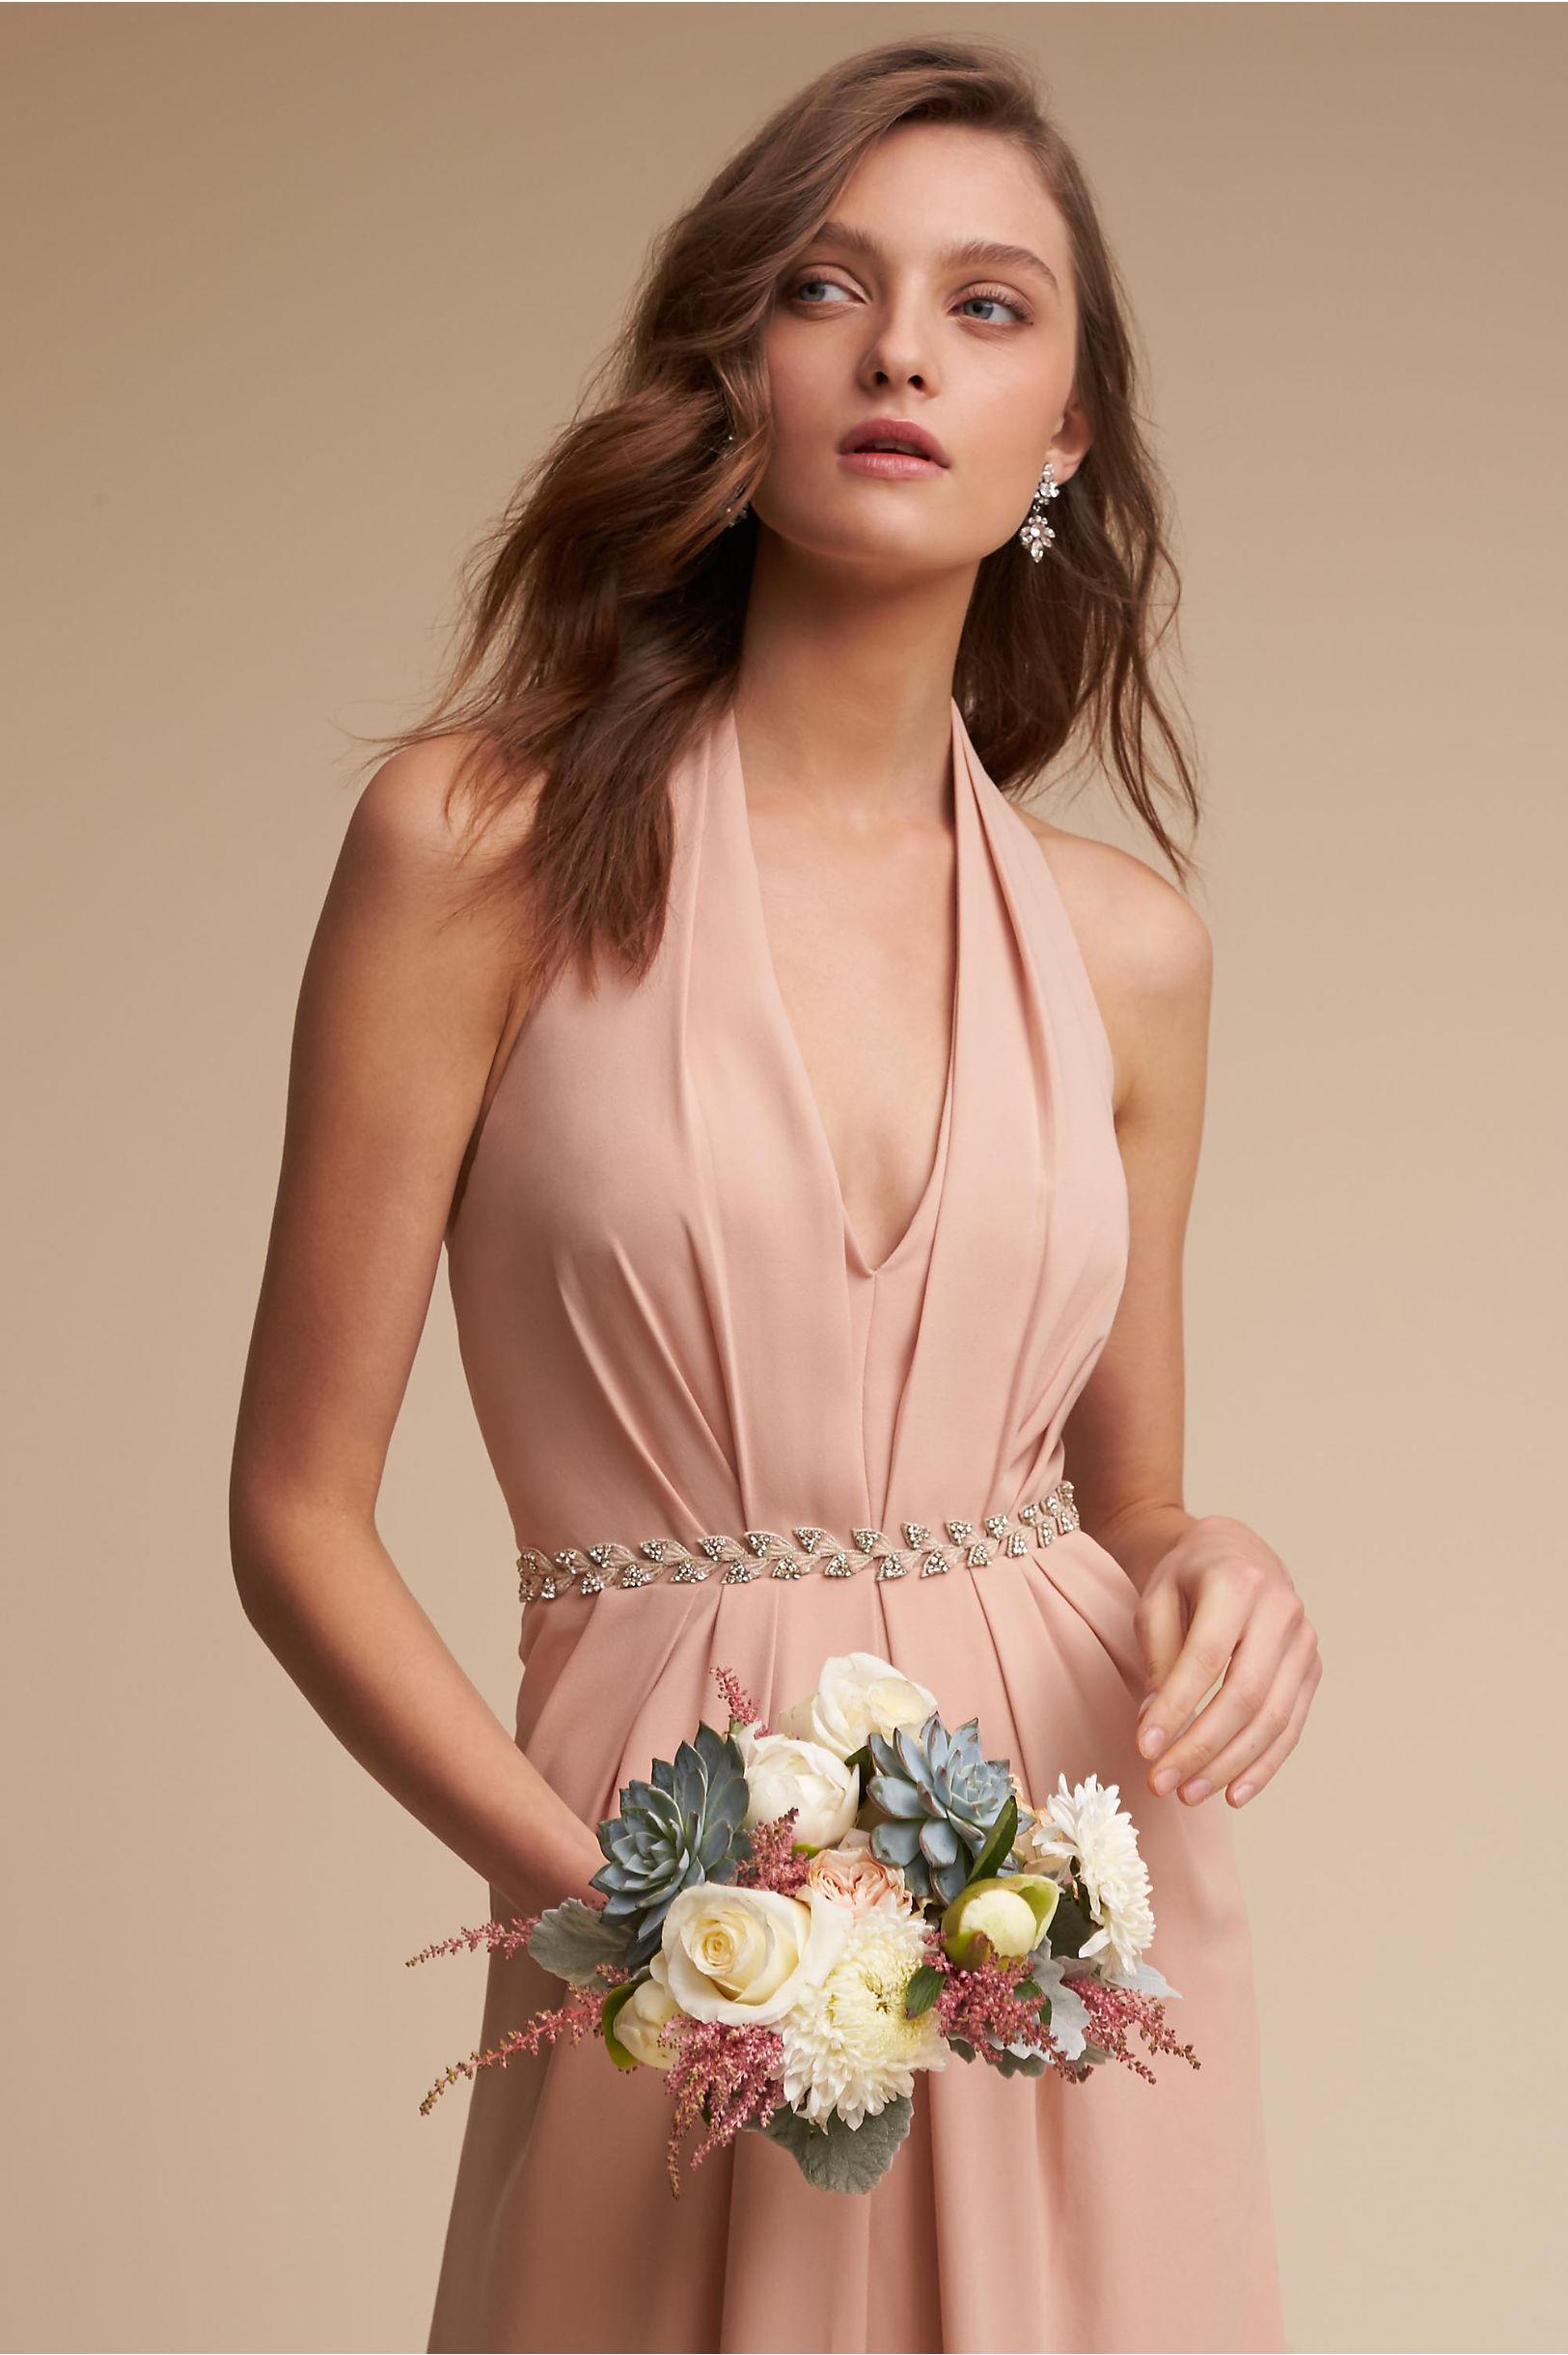 Party Dresses on Sale - Shop Event Dresses On Sale - BHLDN